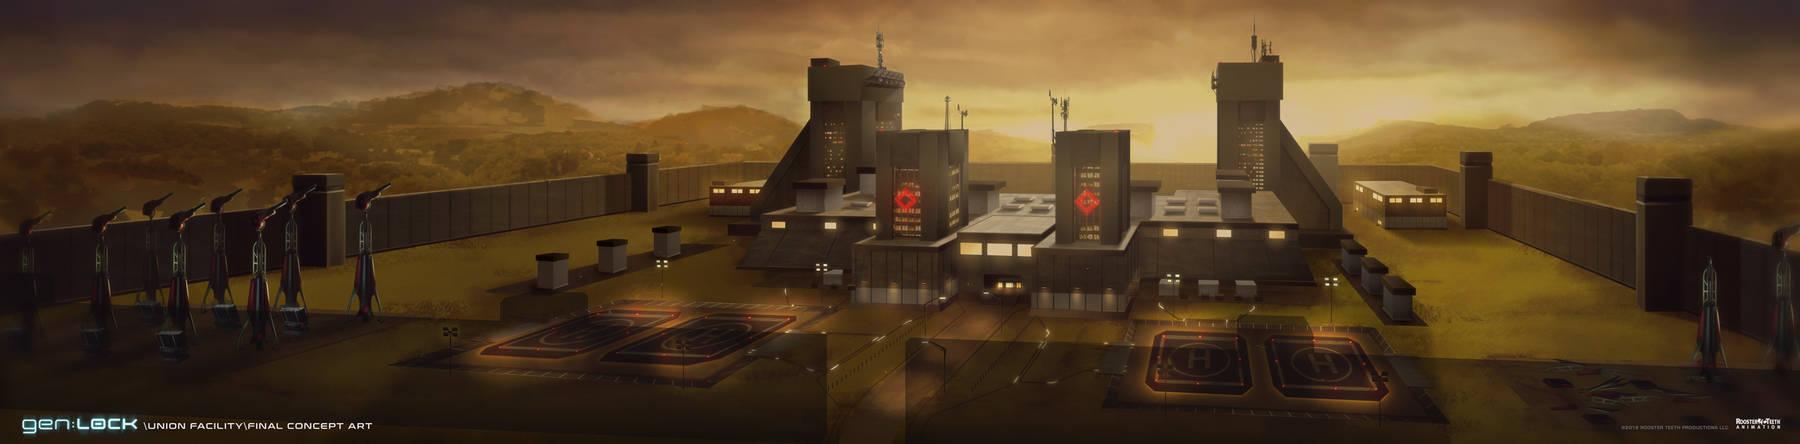 gen:Lock: Union Facility